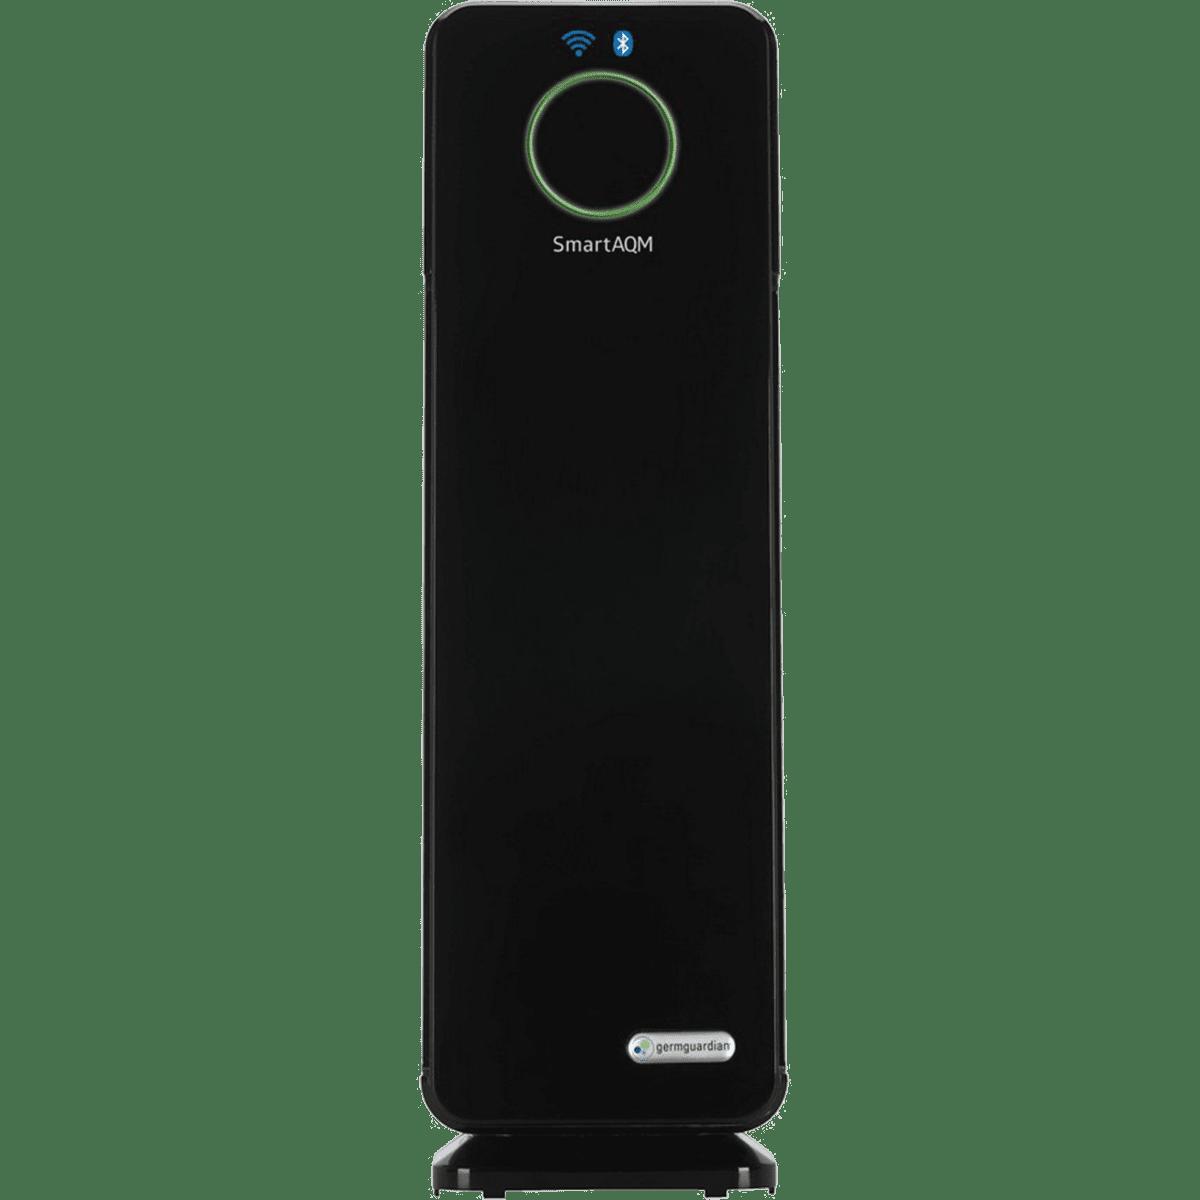 GermGuardian 22 In. 4-in-1 Wifi Smart Tower Air Purifier (CDAP4500BCA)